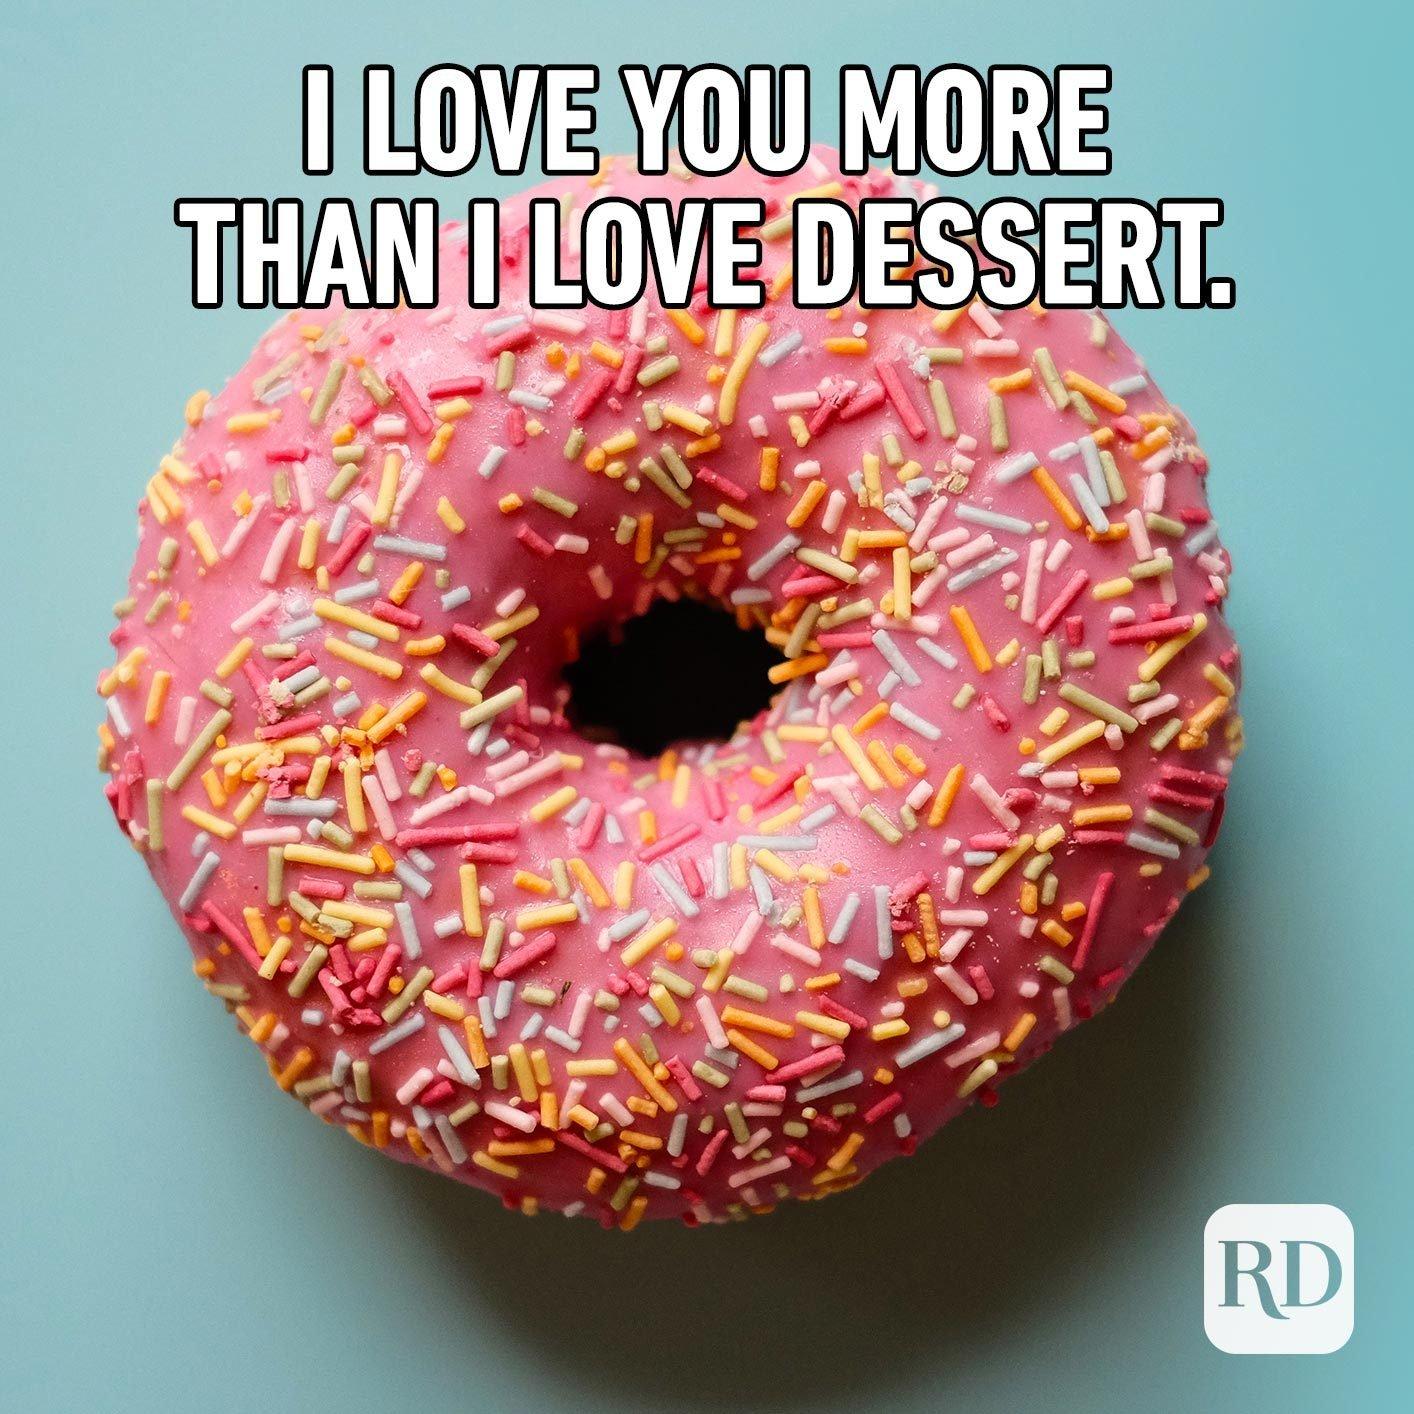 Donut. Meme text: I love you more than I love dessert.